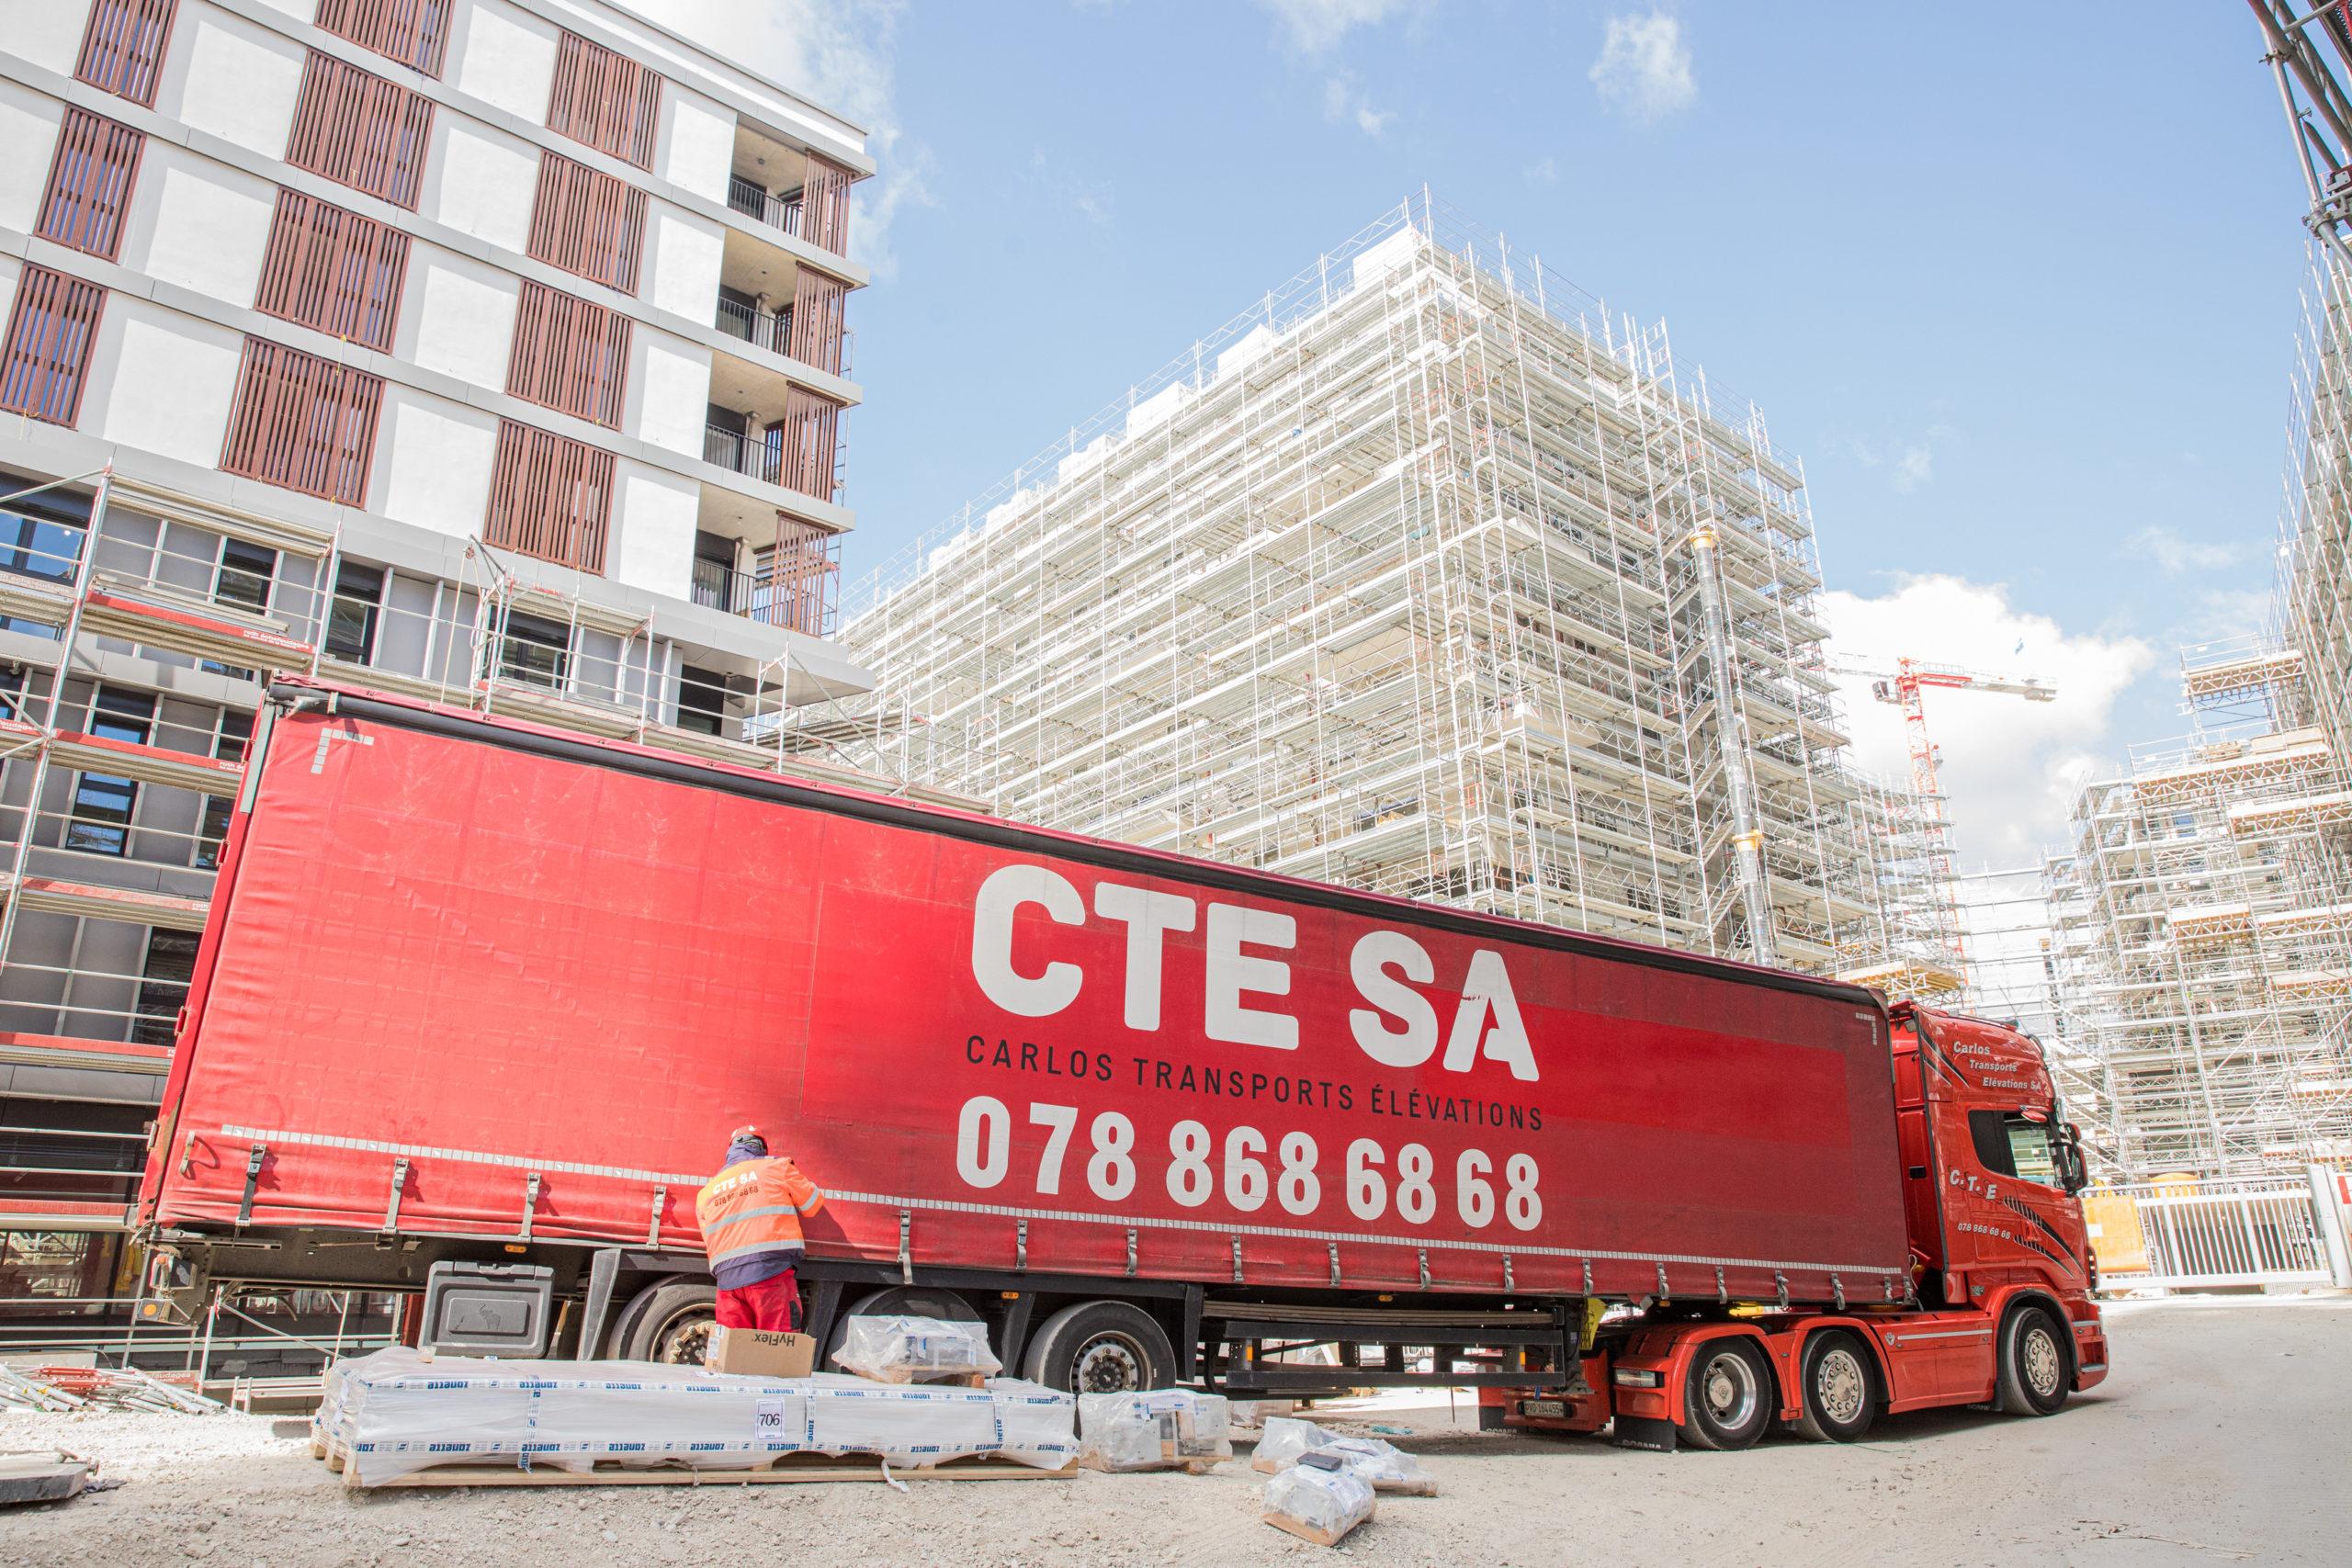 CTE SA - Transport